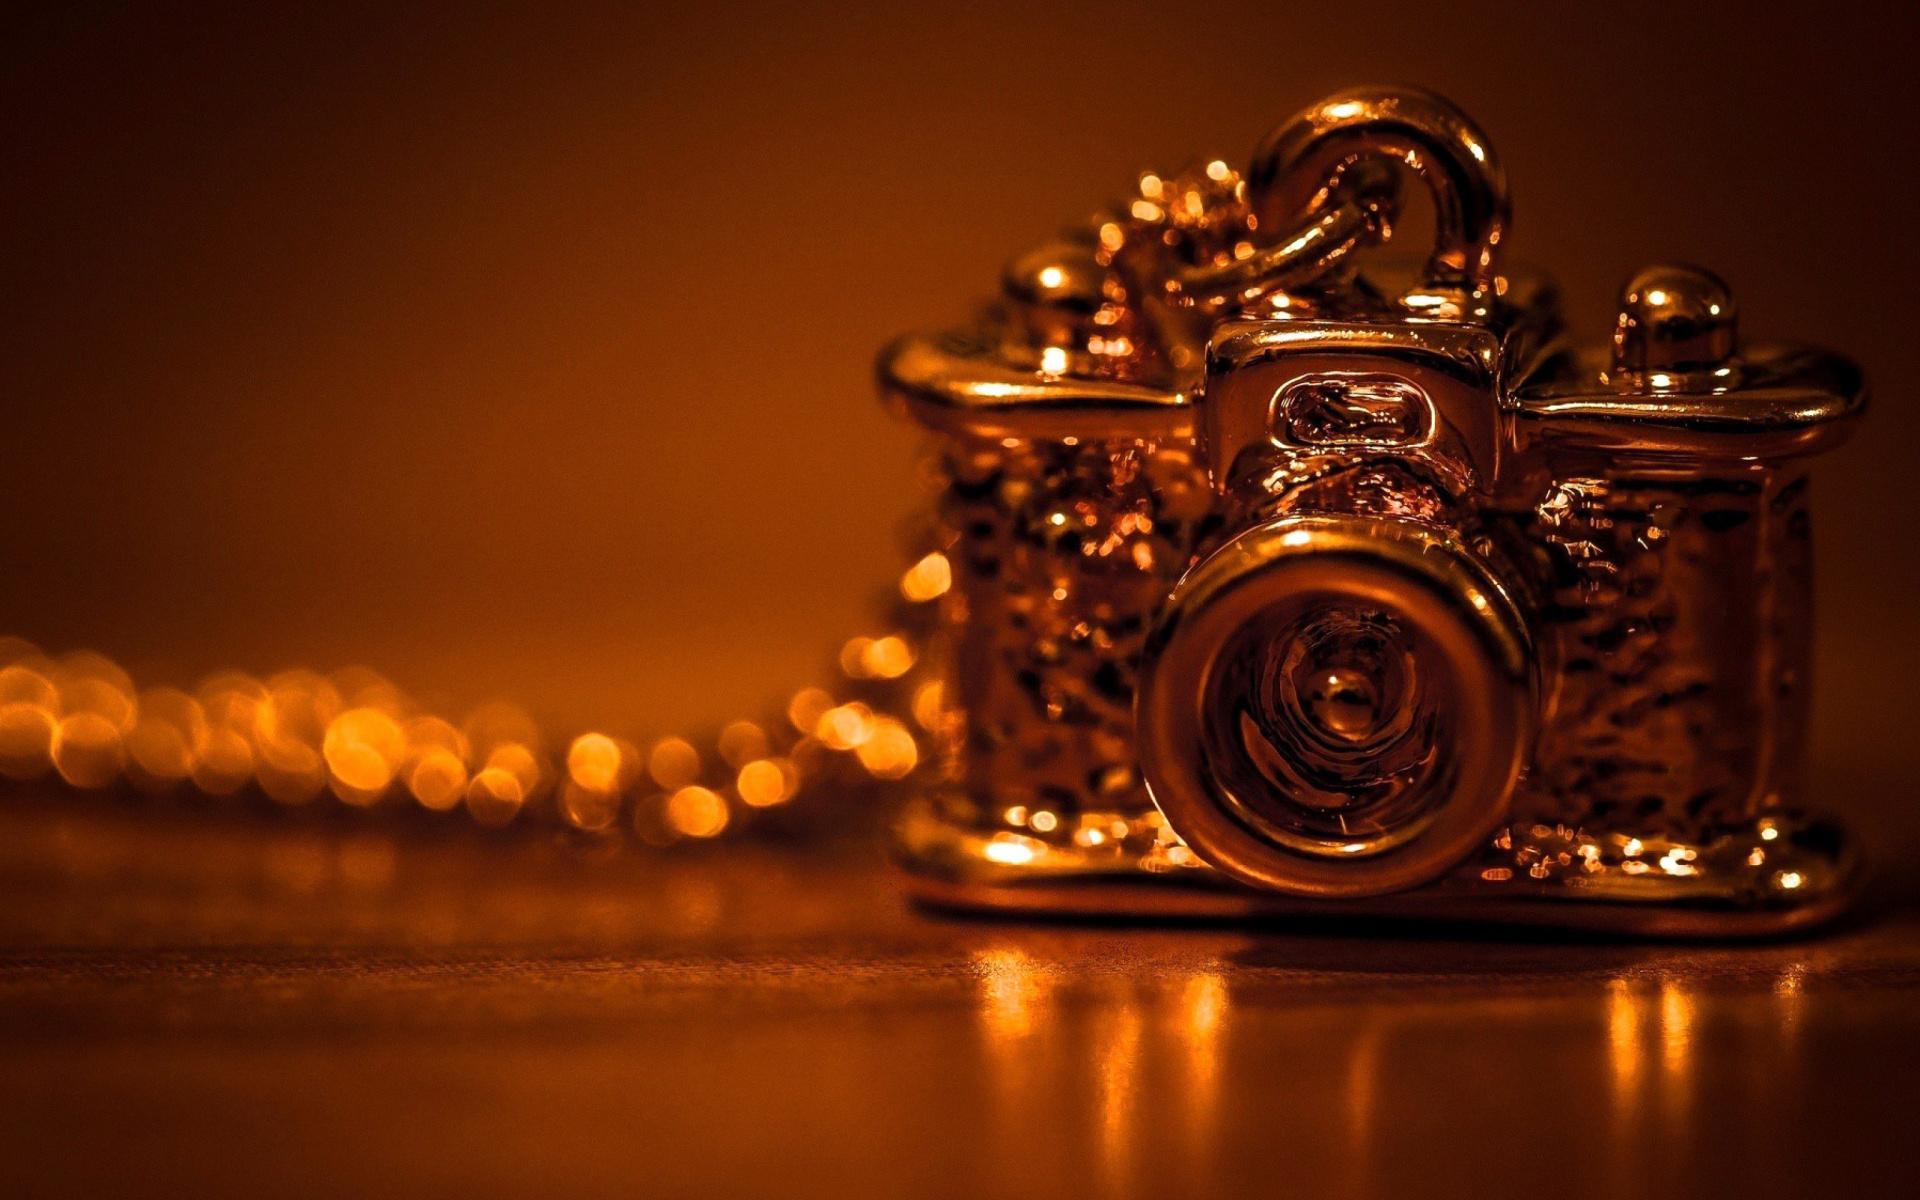 Vintage golden camera fondos de pantalla gratis para for Imagenes full hd para fondo de pantalla